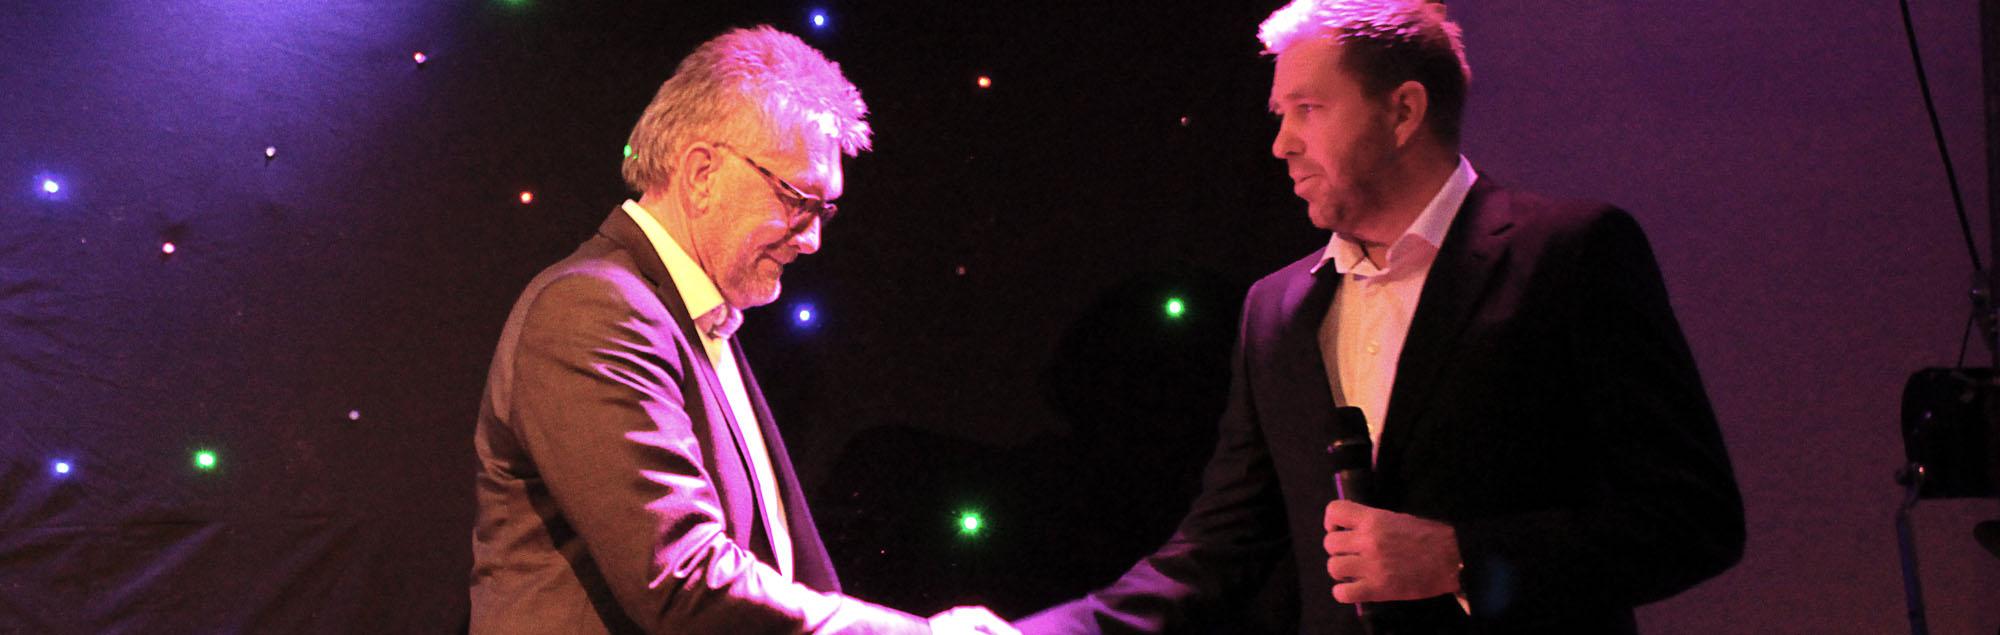 HMS-prisen 2018 til Arild Bråthen